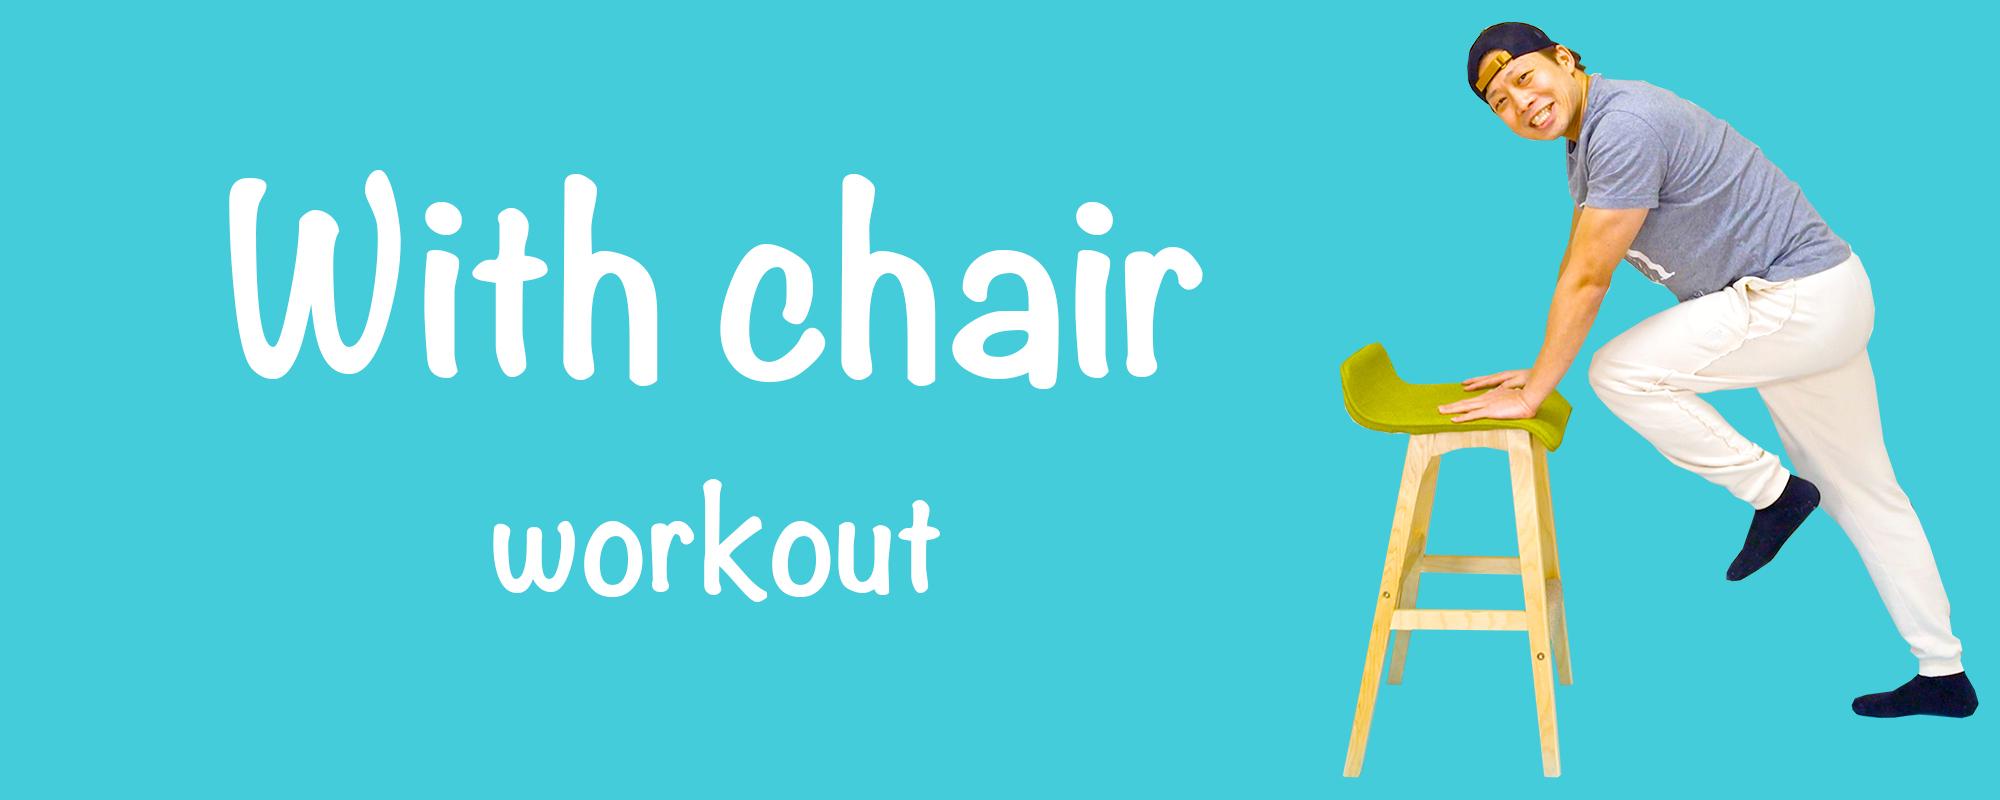 Chair workout 7 days program